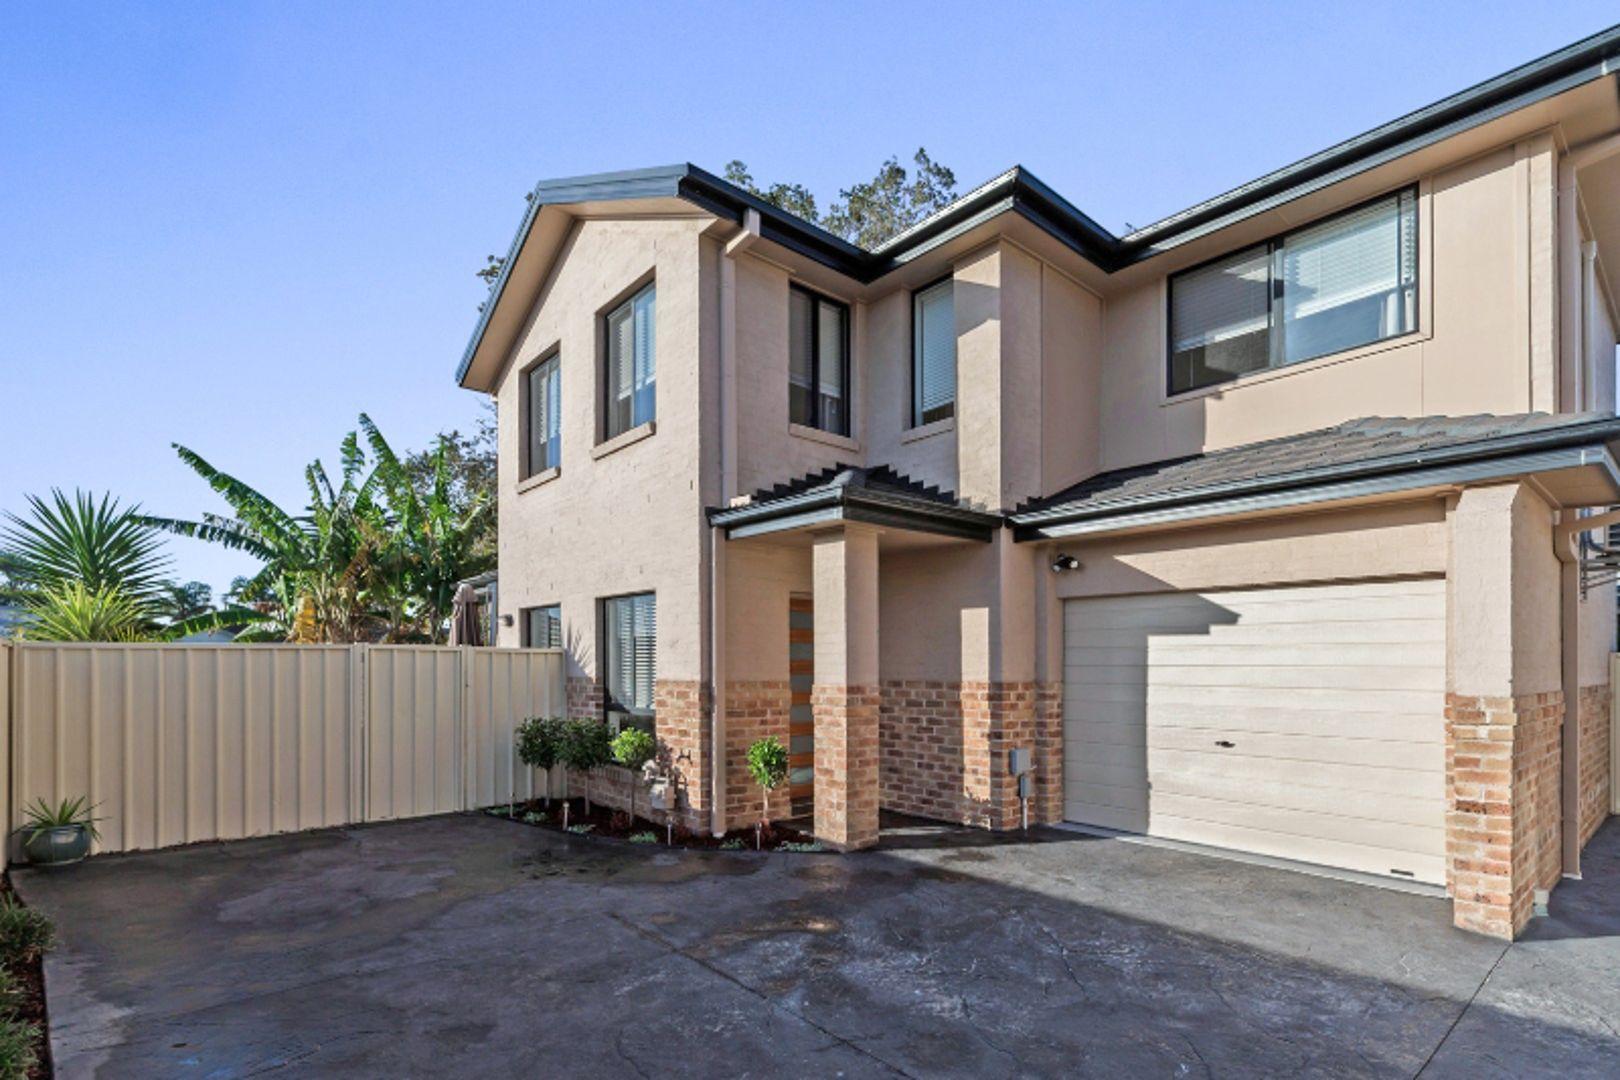 3/36 Swadling Street, Long Jetty NSW 2261, Image 1